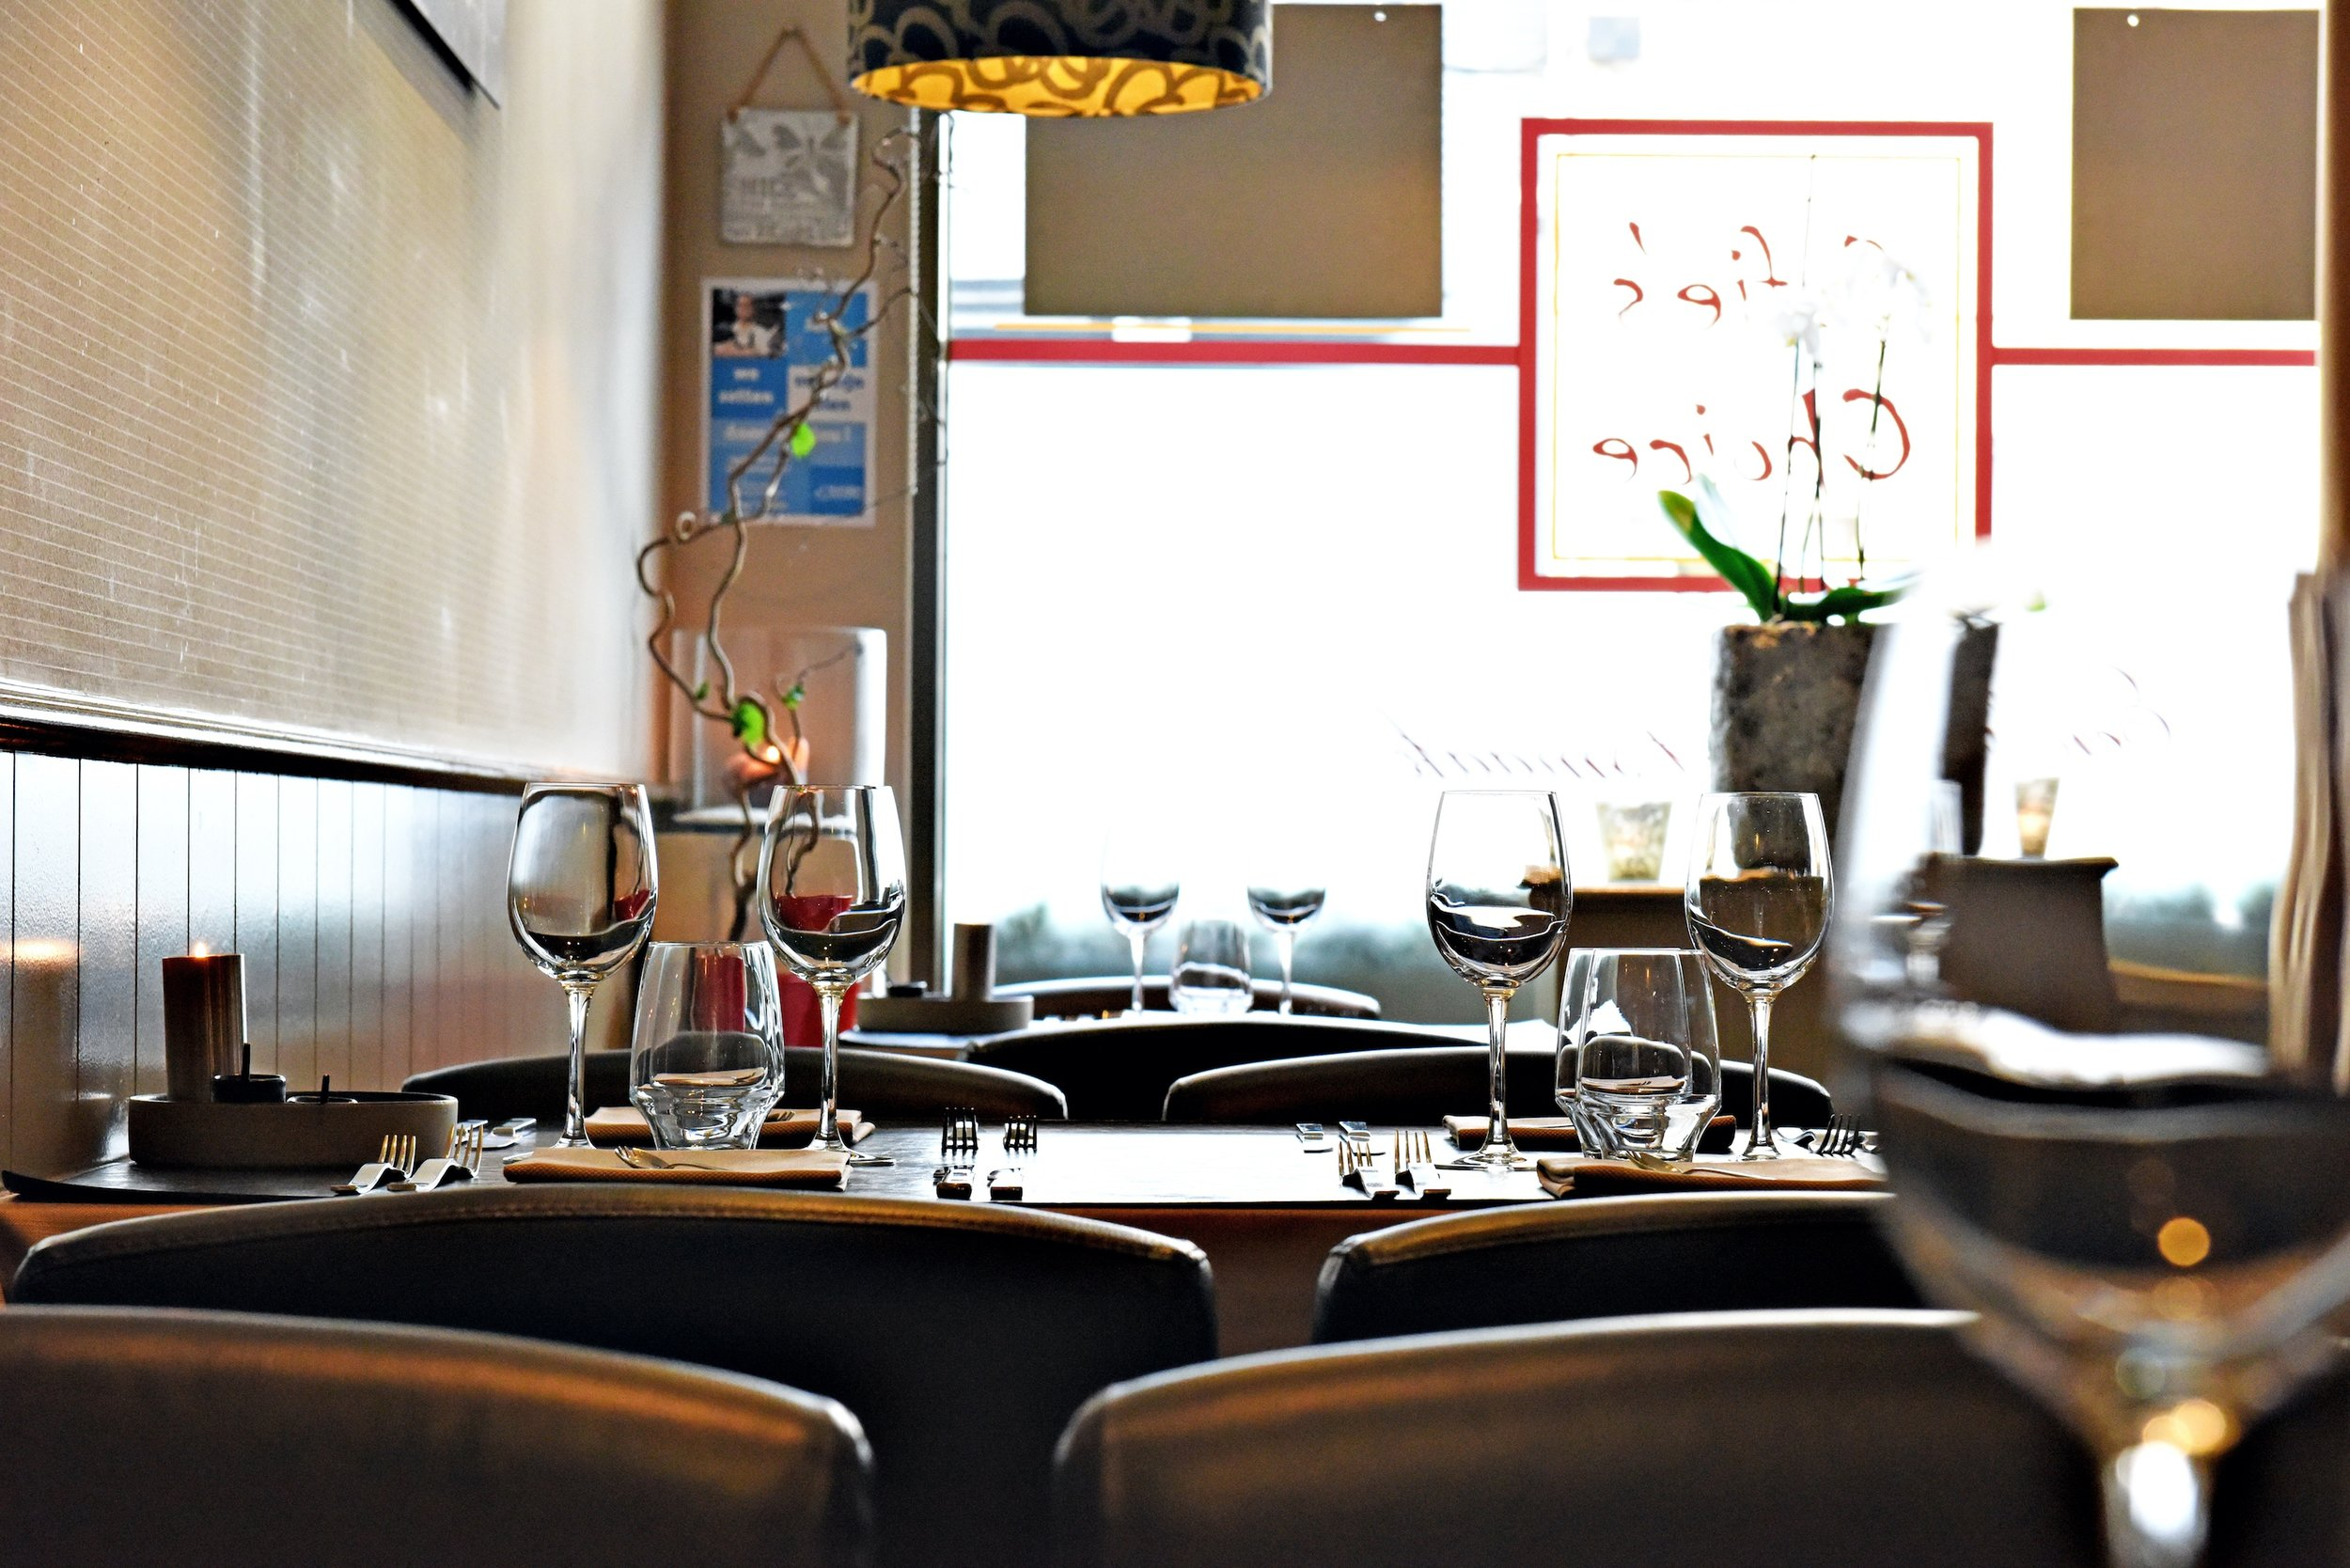 11 sofie s choice roeselare brasserie restaurant bart albrecht fotograaf food tablefever.jpg